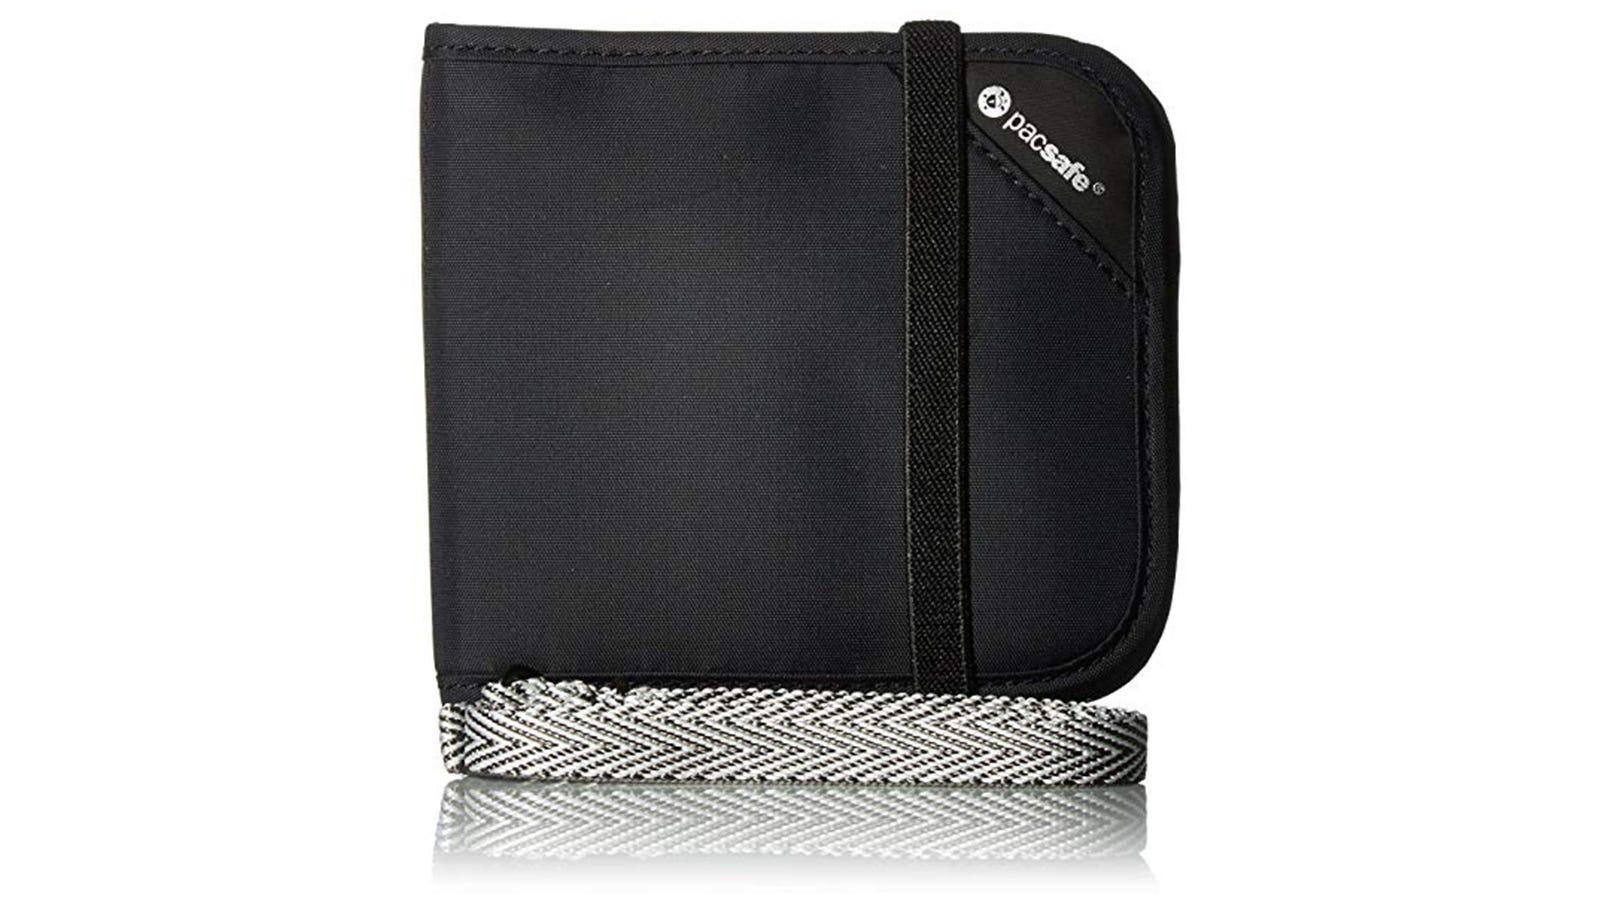 Pacsafe Rfidsafe V100 Anti-Theft RFID Blocking Bi-fold Wallet